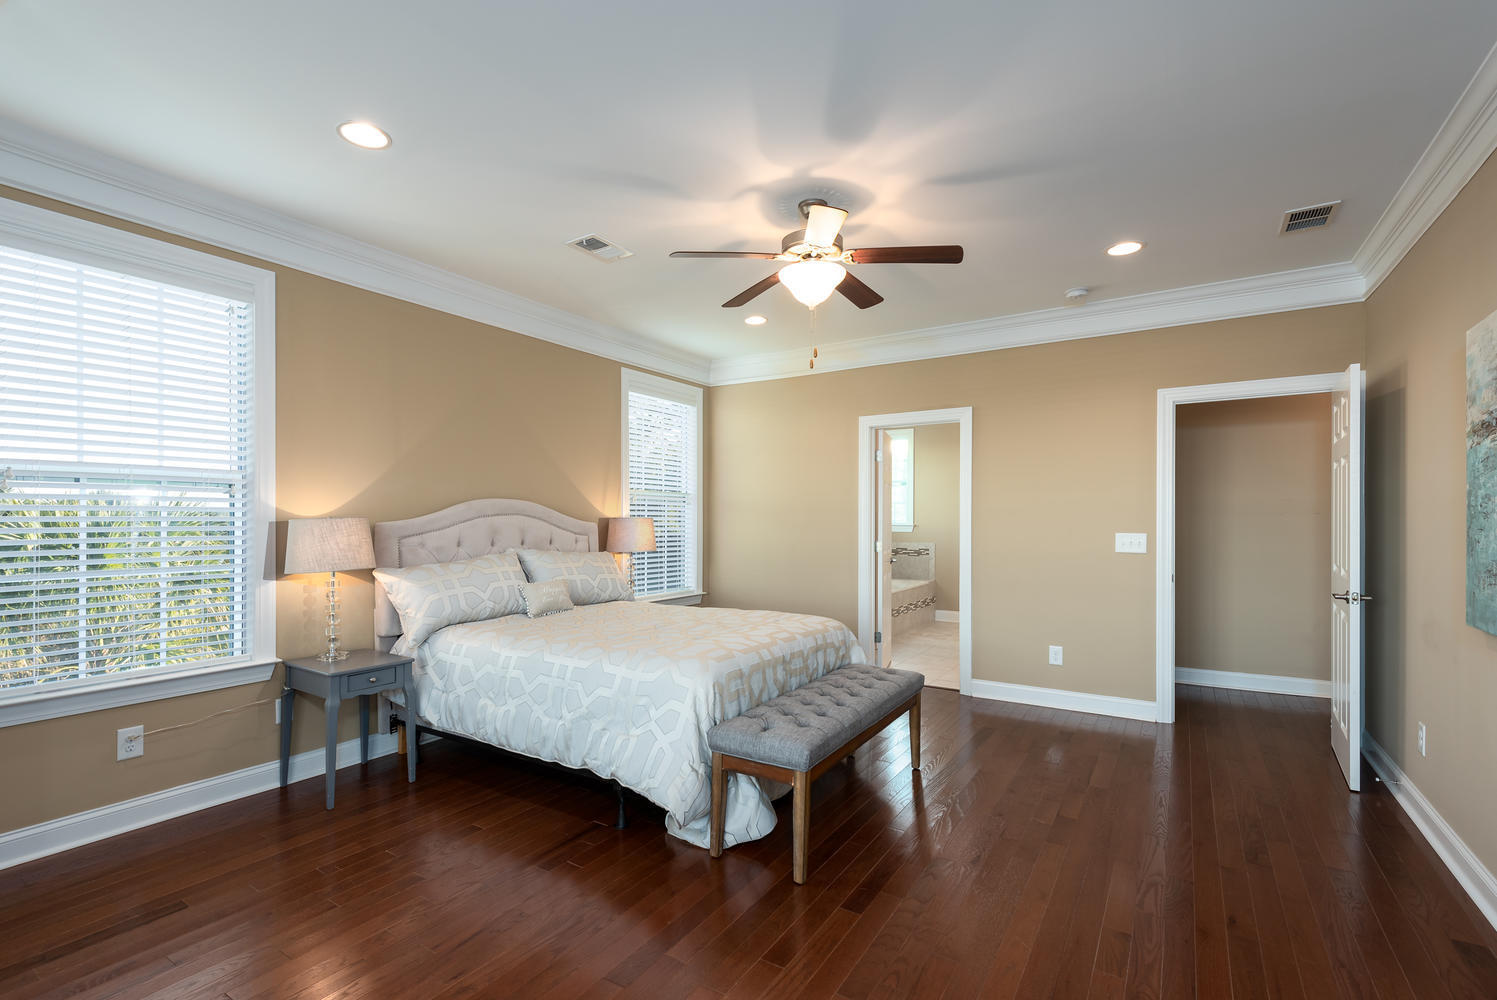 River Reach Pointe Homes For Sale - 1216 Rivers Reach Drive, Charleston, SC - 80